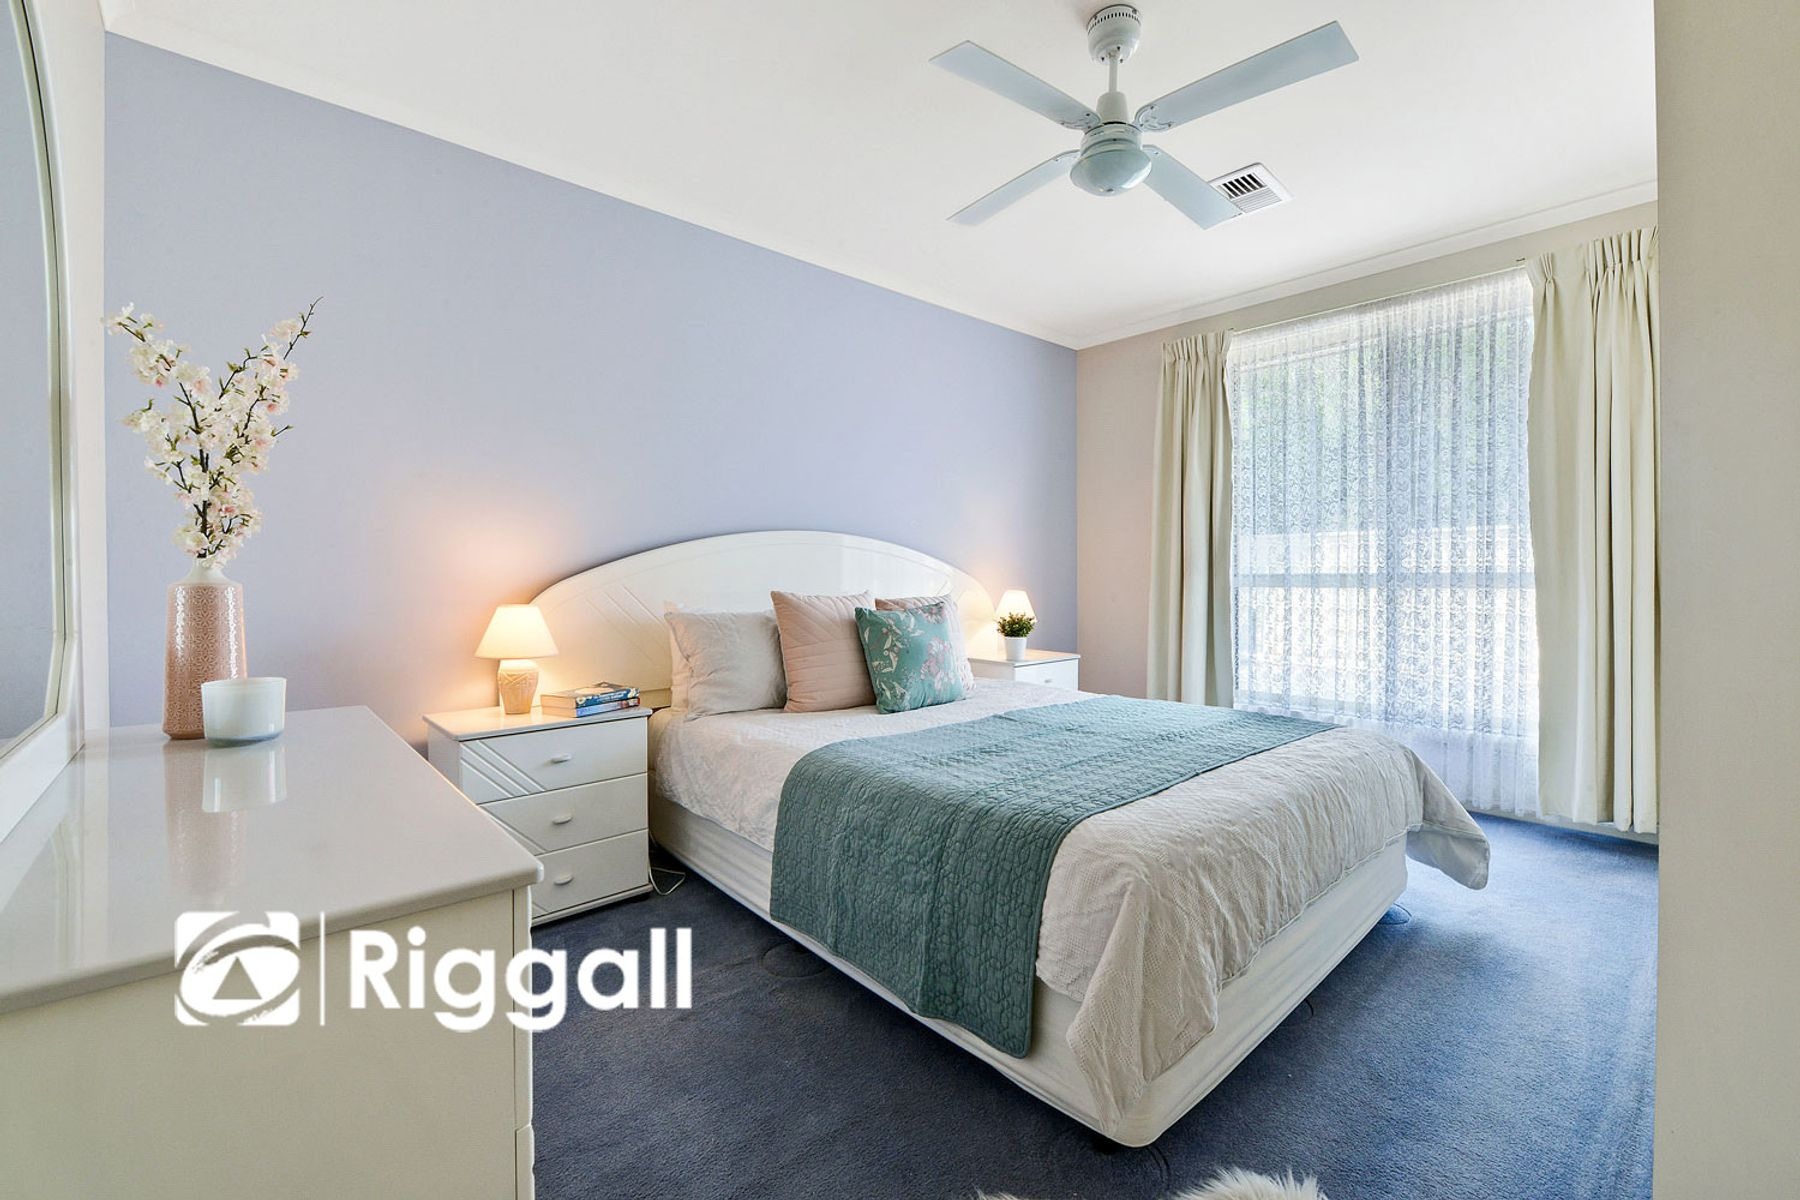 2/5 Braeside Avenue, Holden Hill, SA 5088